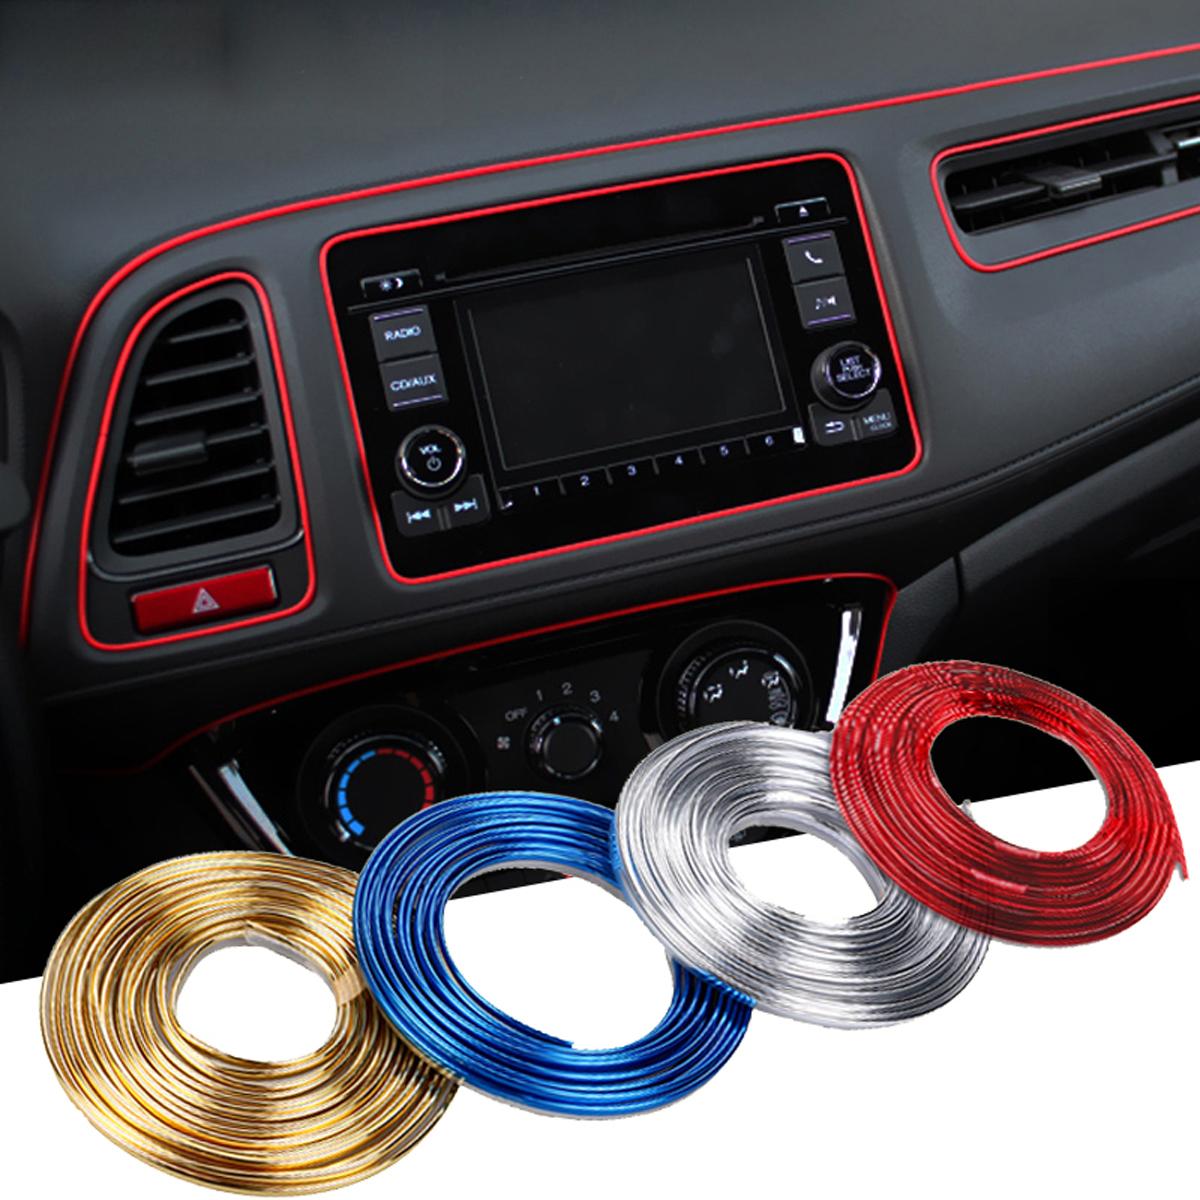 5m//Roll Car Interior Moulding Trim Decor Strip Decorative Line Silver Universal